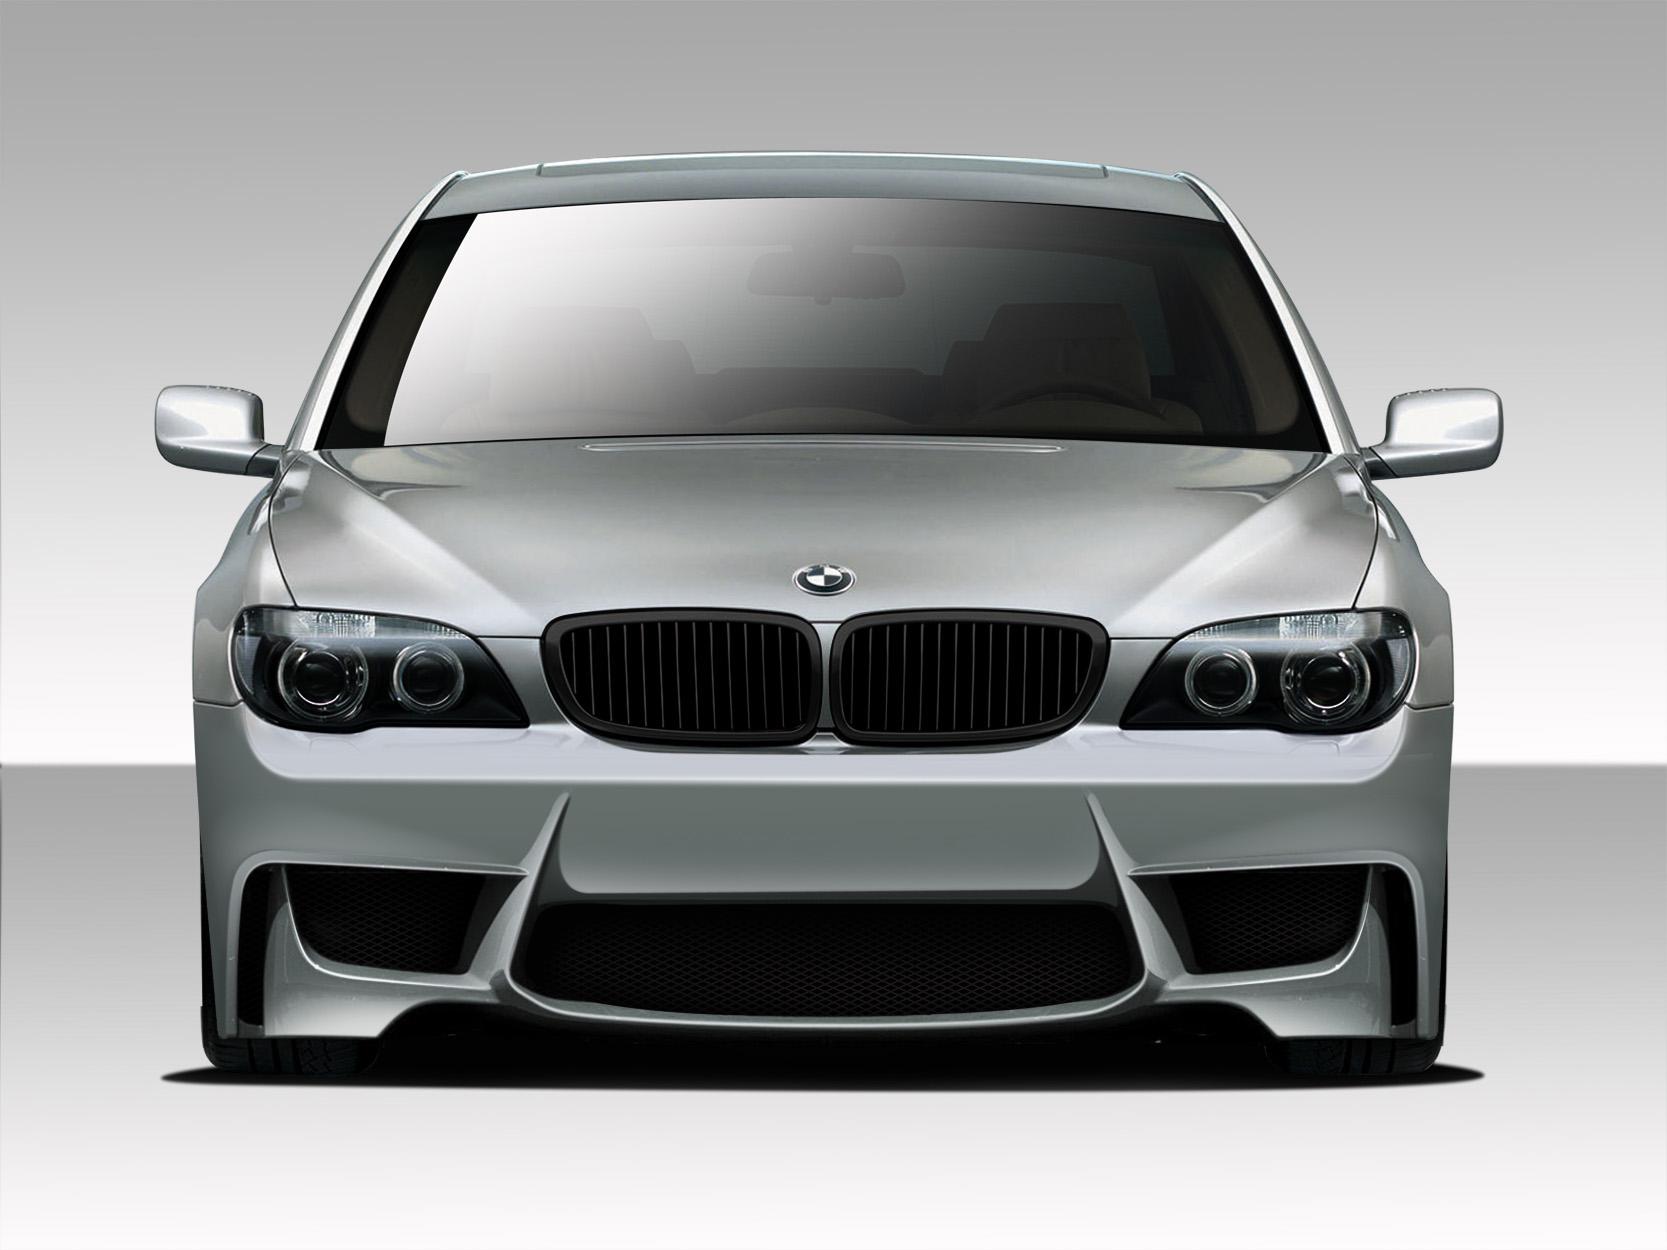 Bmw 750li Body Kit >> Welcome to Extreme Dimensions :: Inventory Item :: 2006-2008 BMW 7 Series E65 E66 Duraflex 1M ...